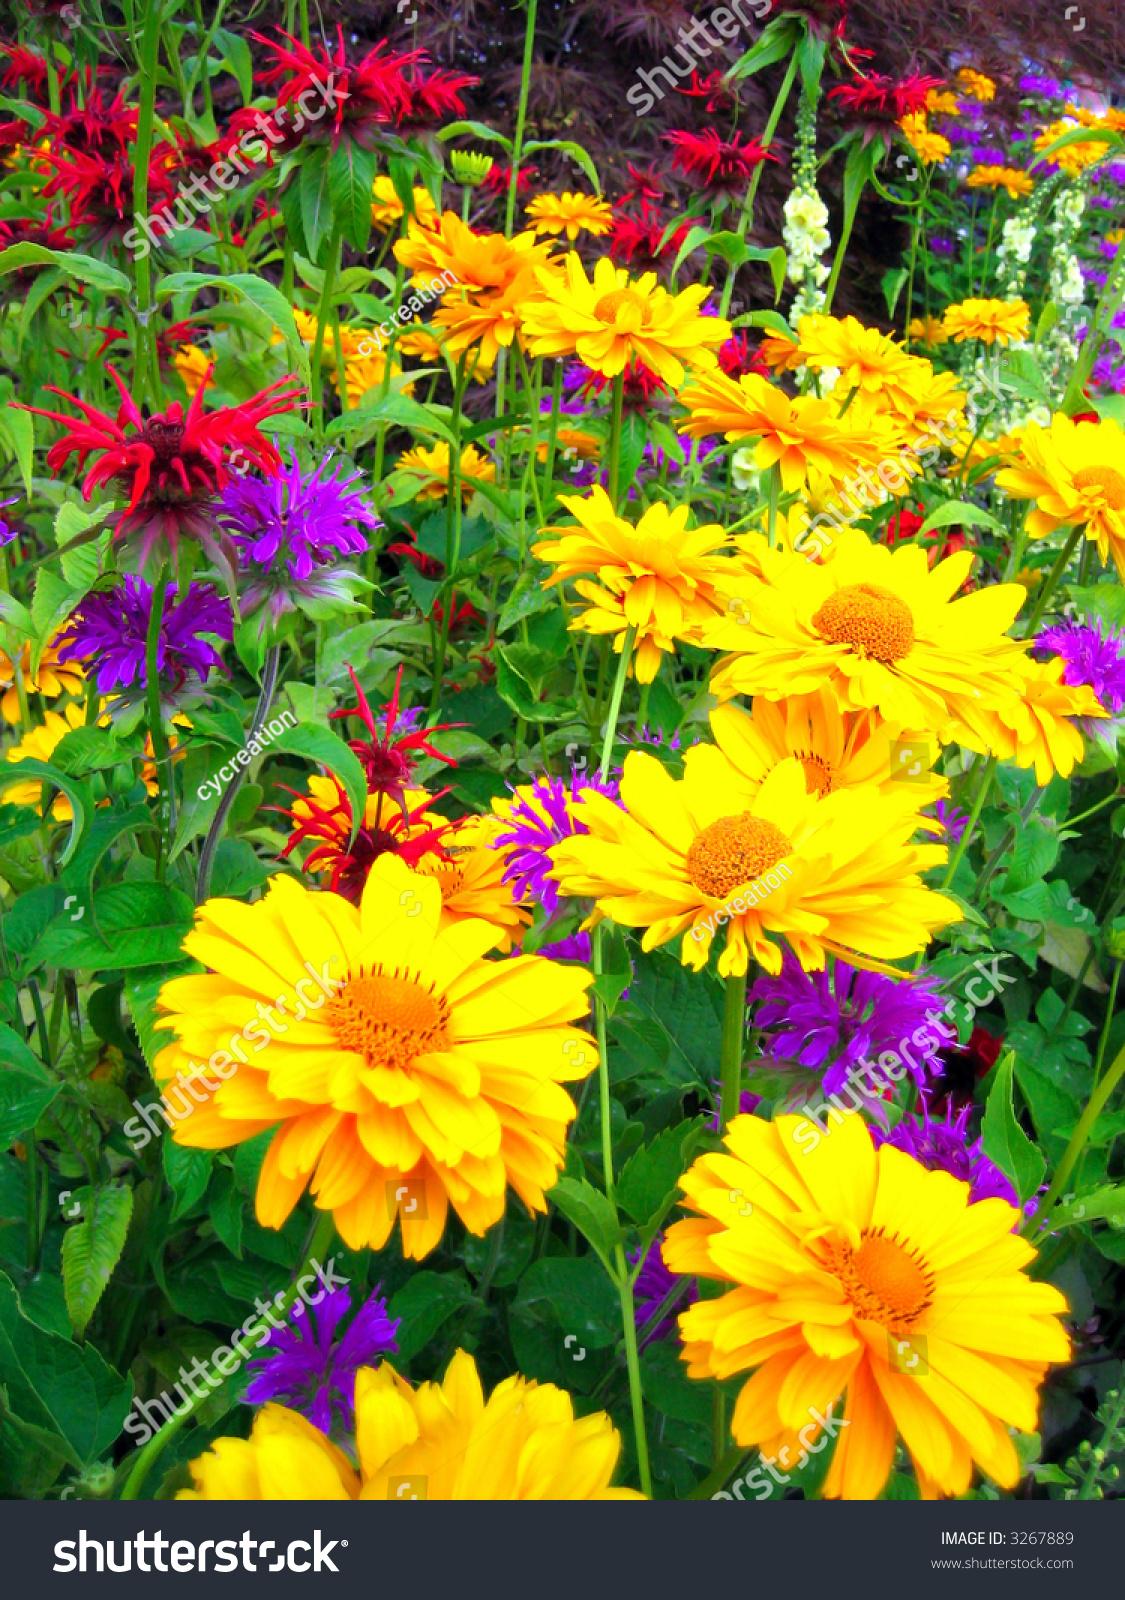 Bright yellow flowers summer season stock photo edit now 3267889 bright yellow flowers in summer season mightylinksfo